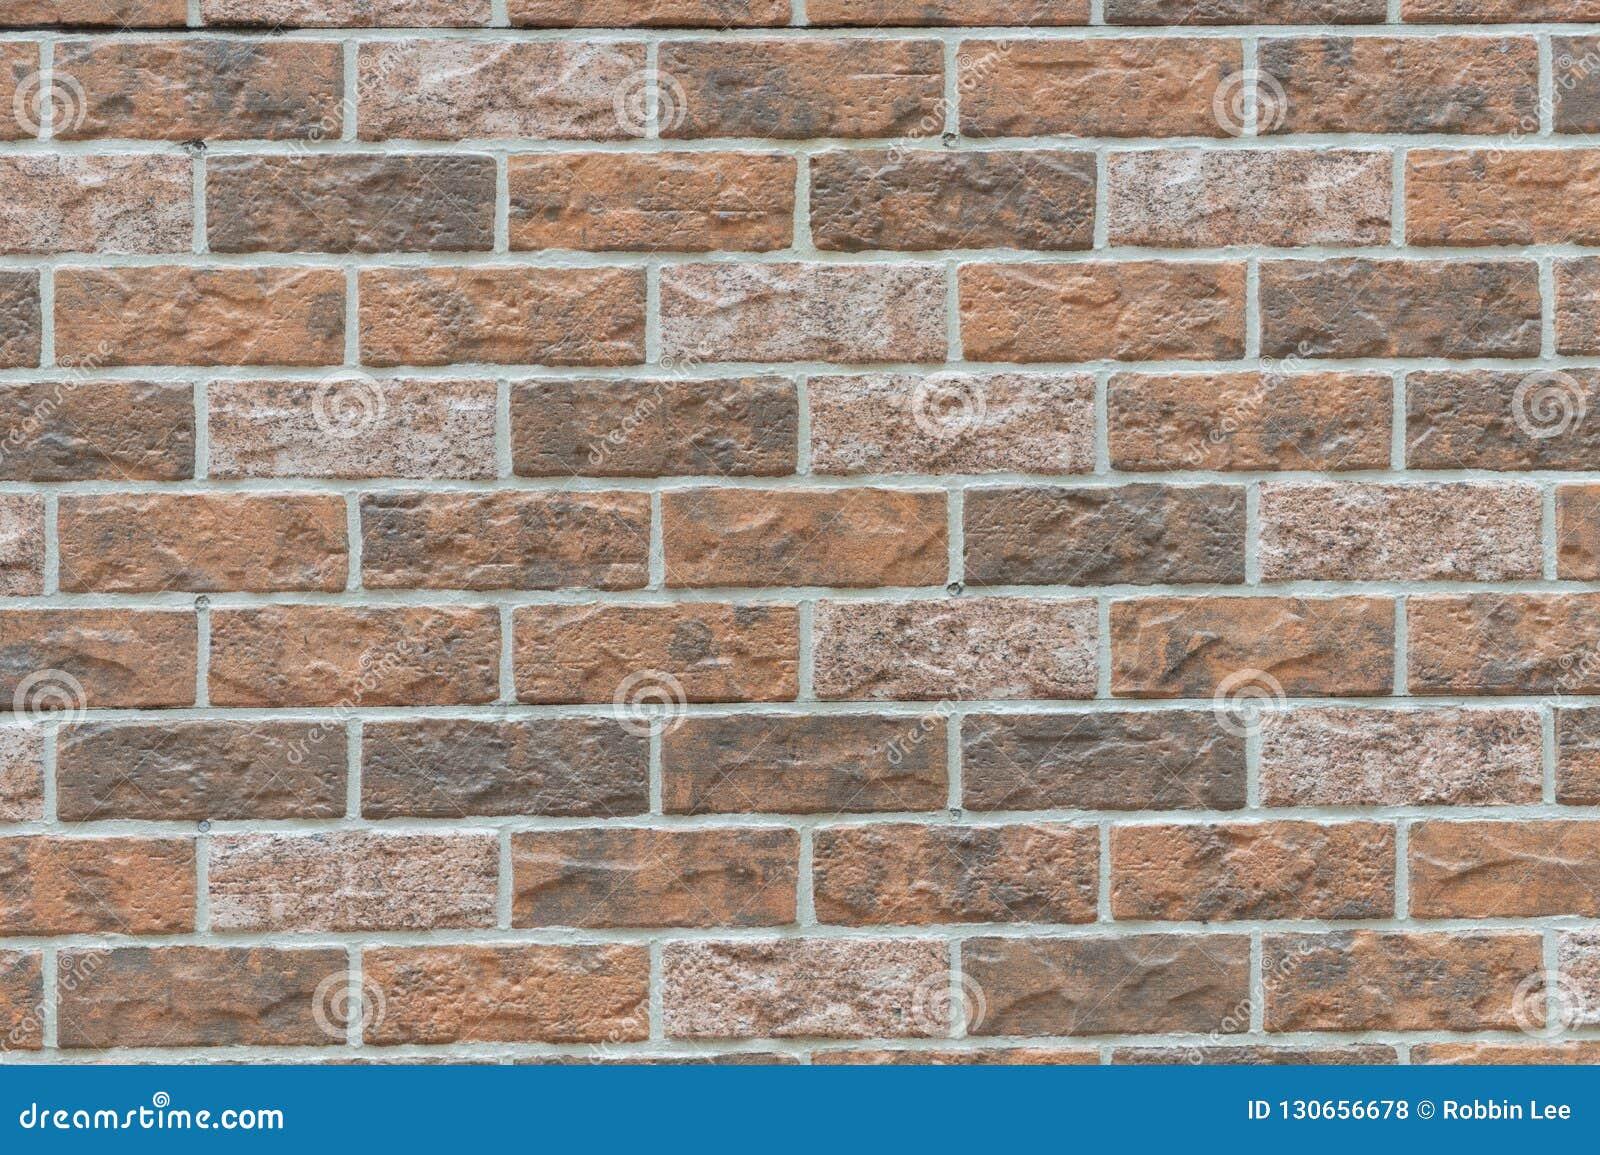 Ceramic Brick Tile Wall Stock Photo Image Of Decoration 130656678